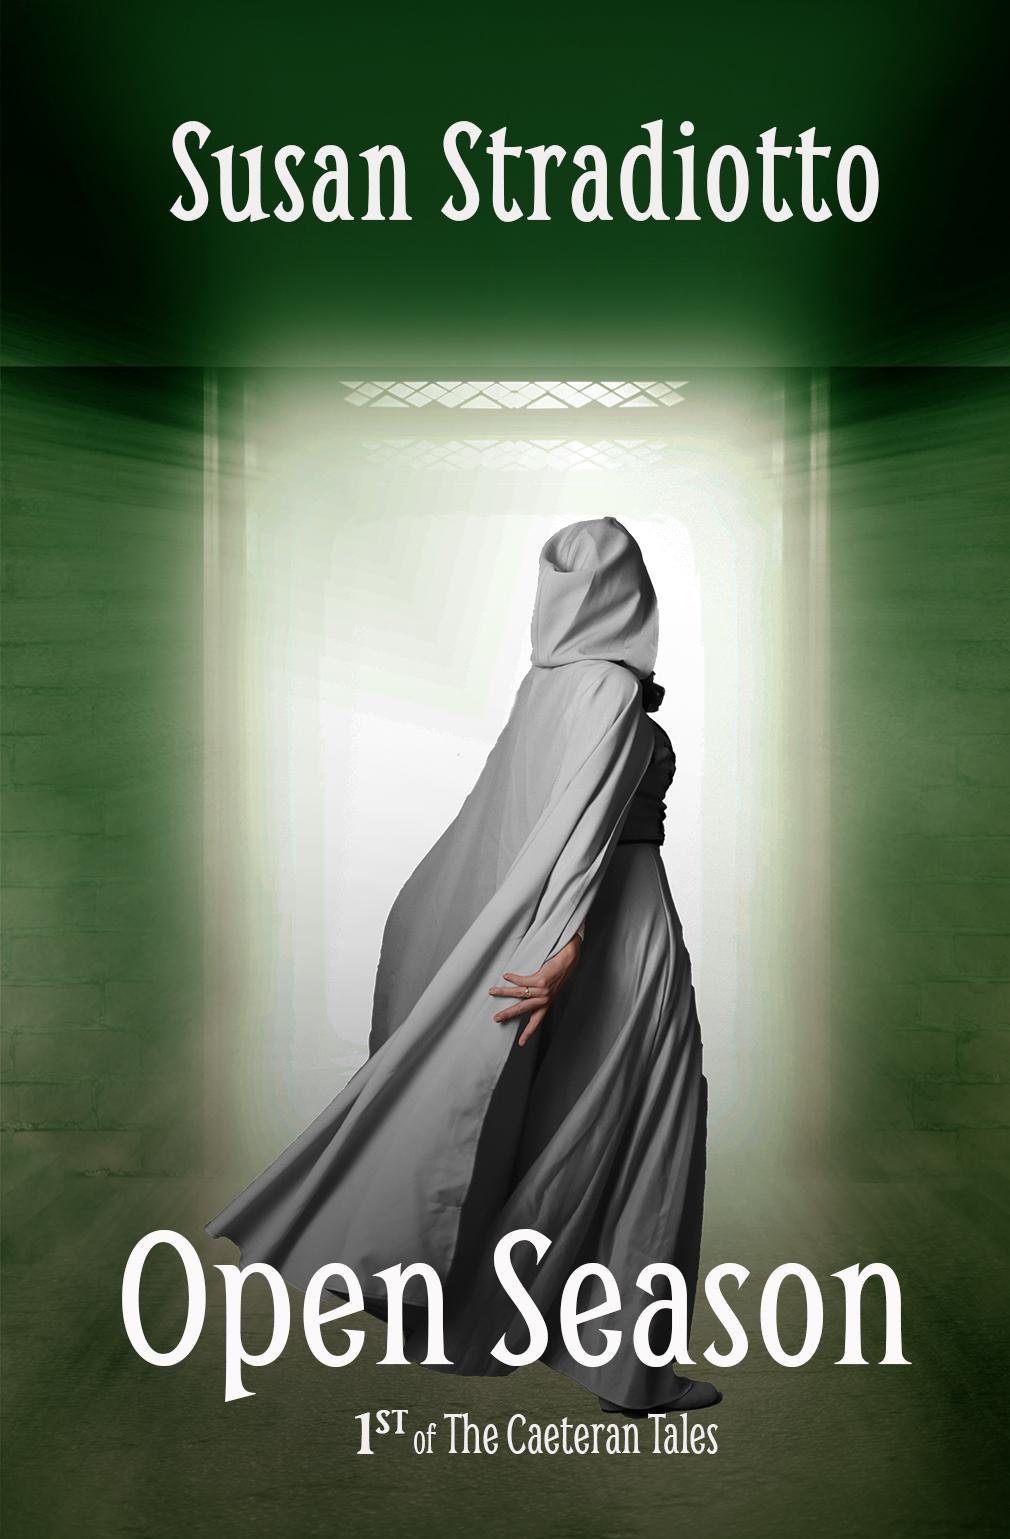 Open Season, 1st of the Caeteran Tales